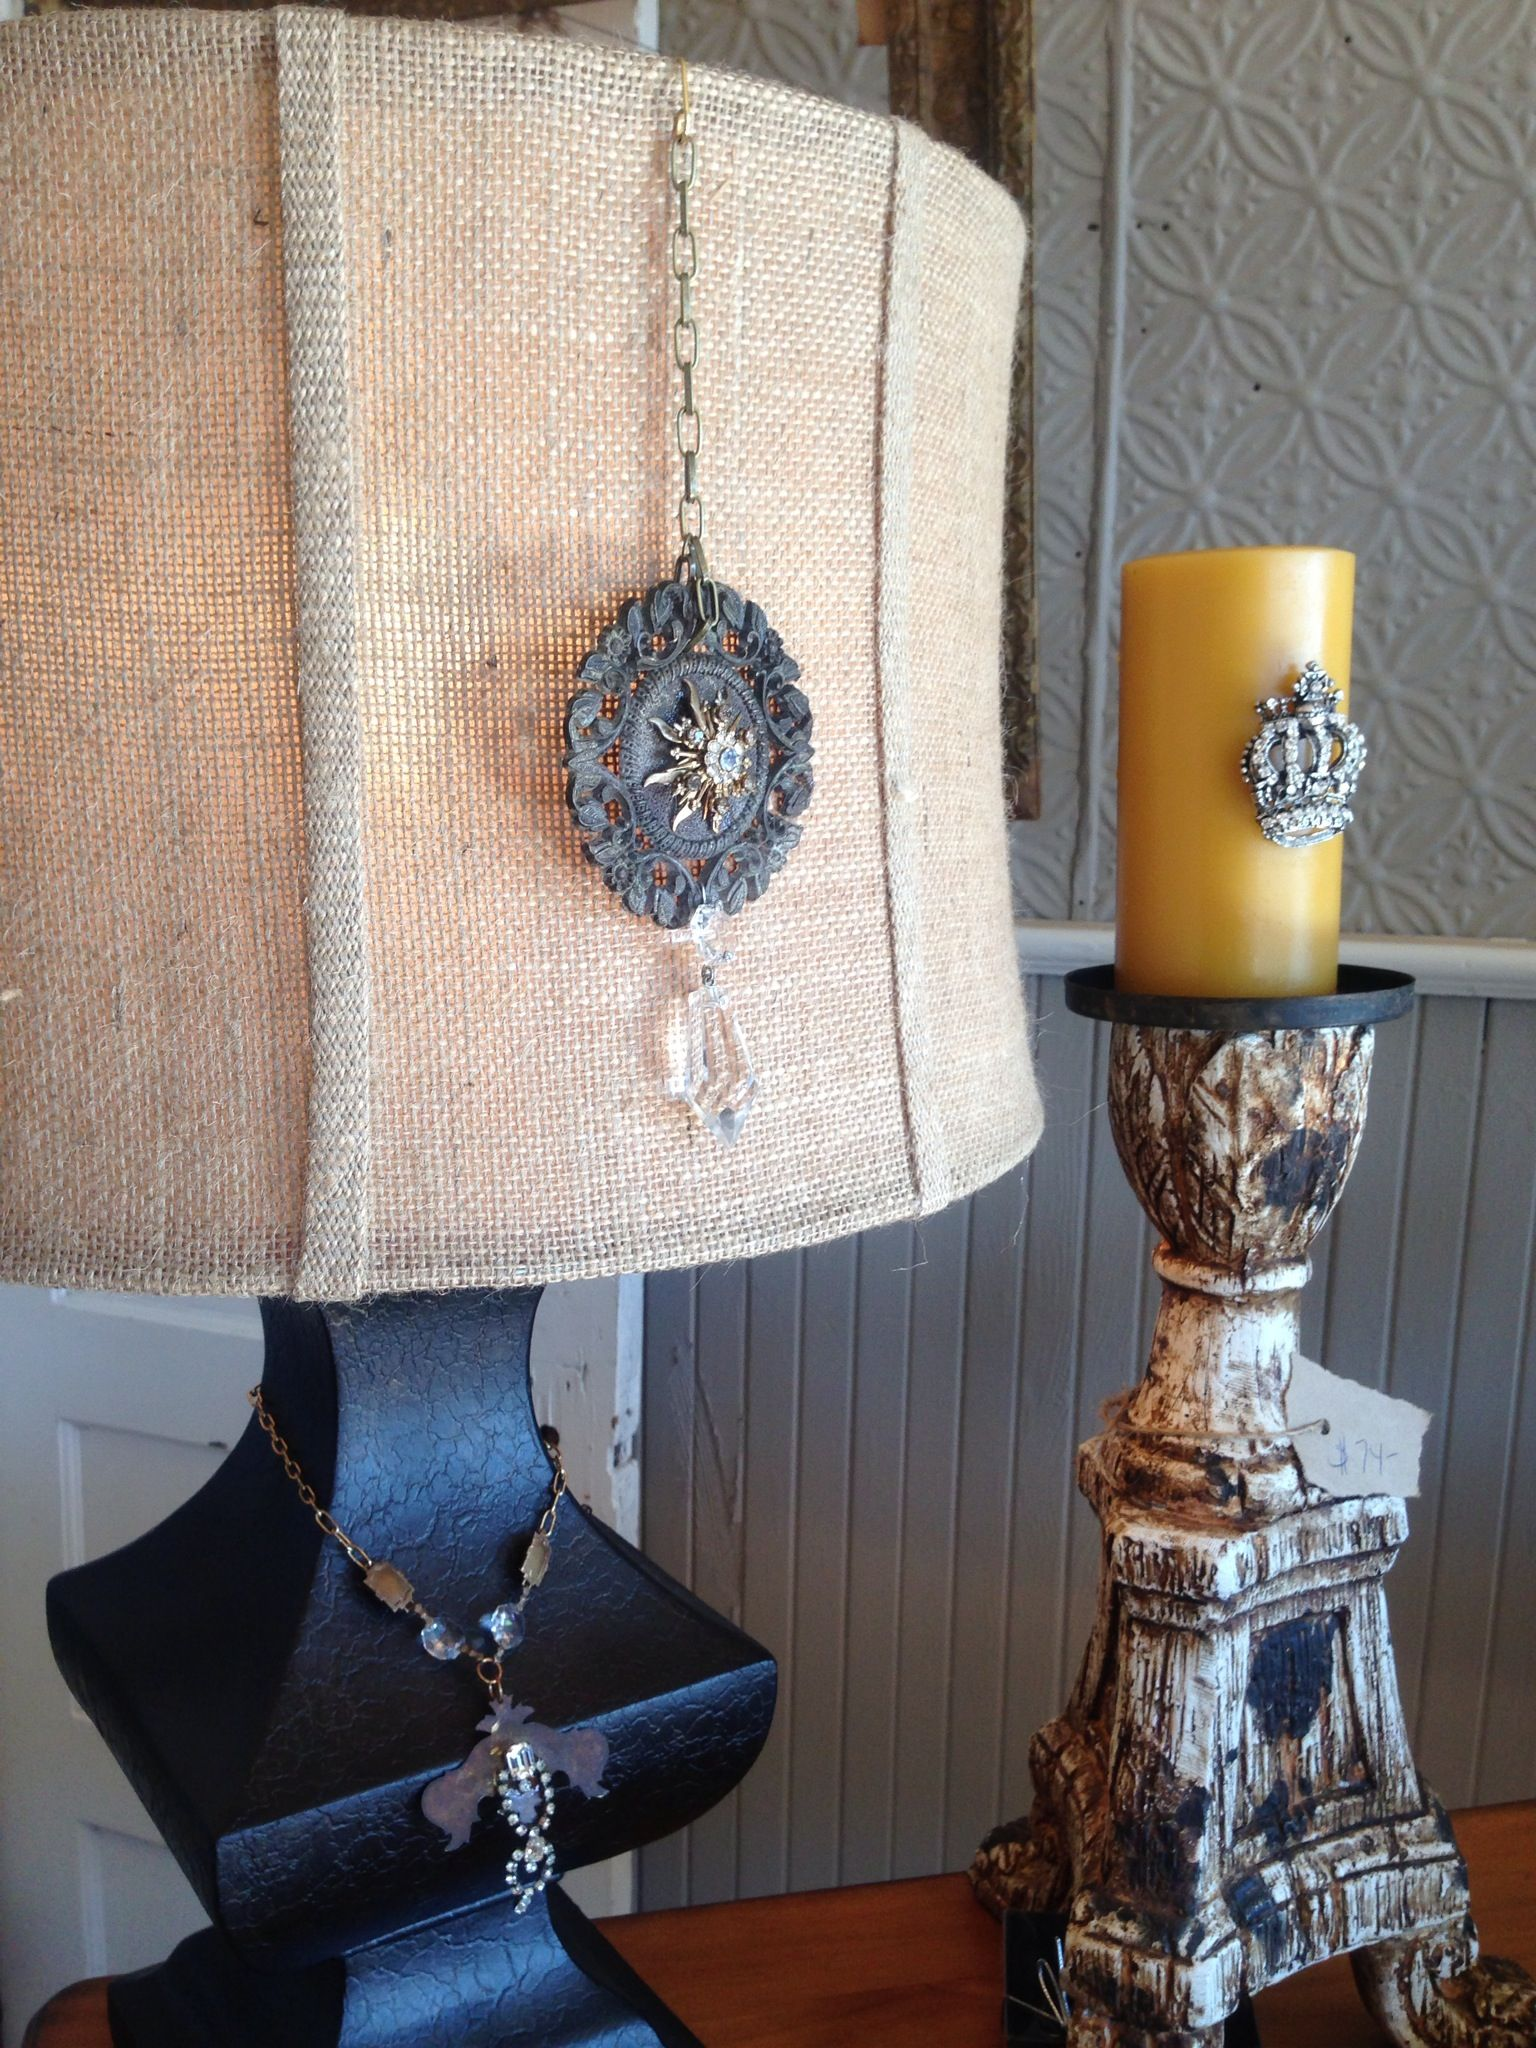 Lamp And Candle Decor Candle Decor Decor Lamp